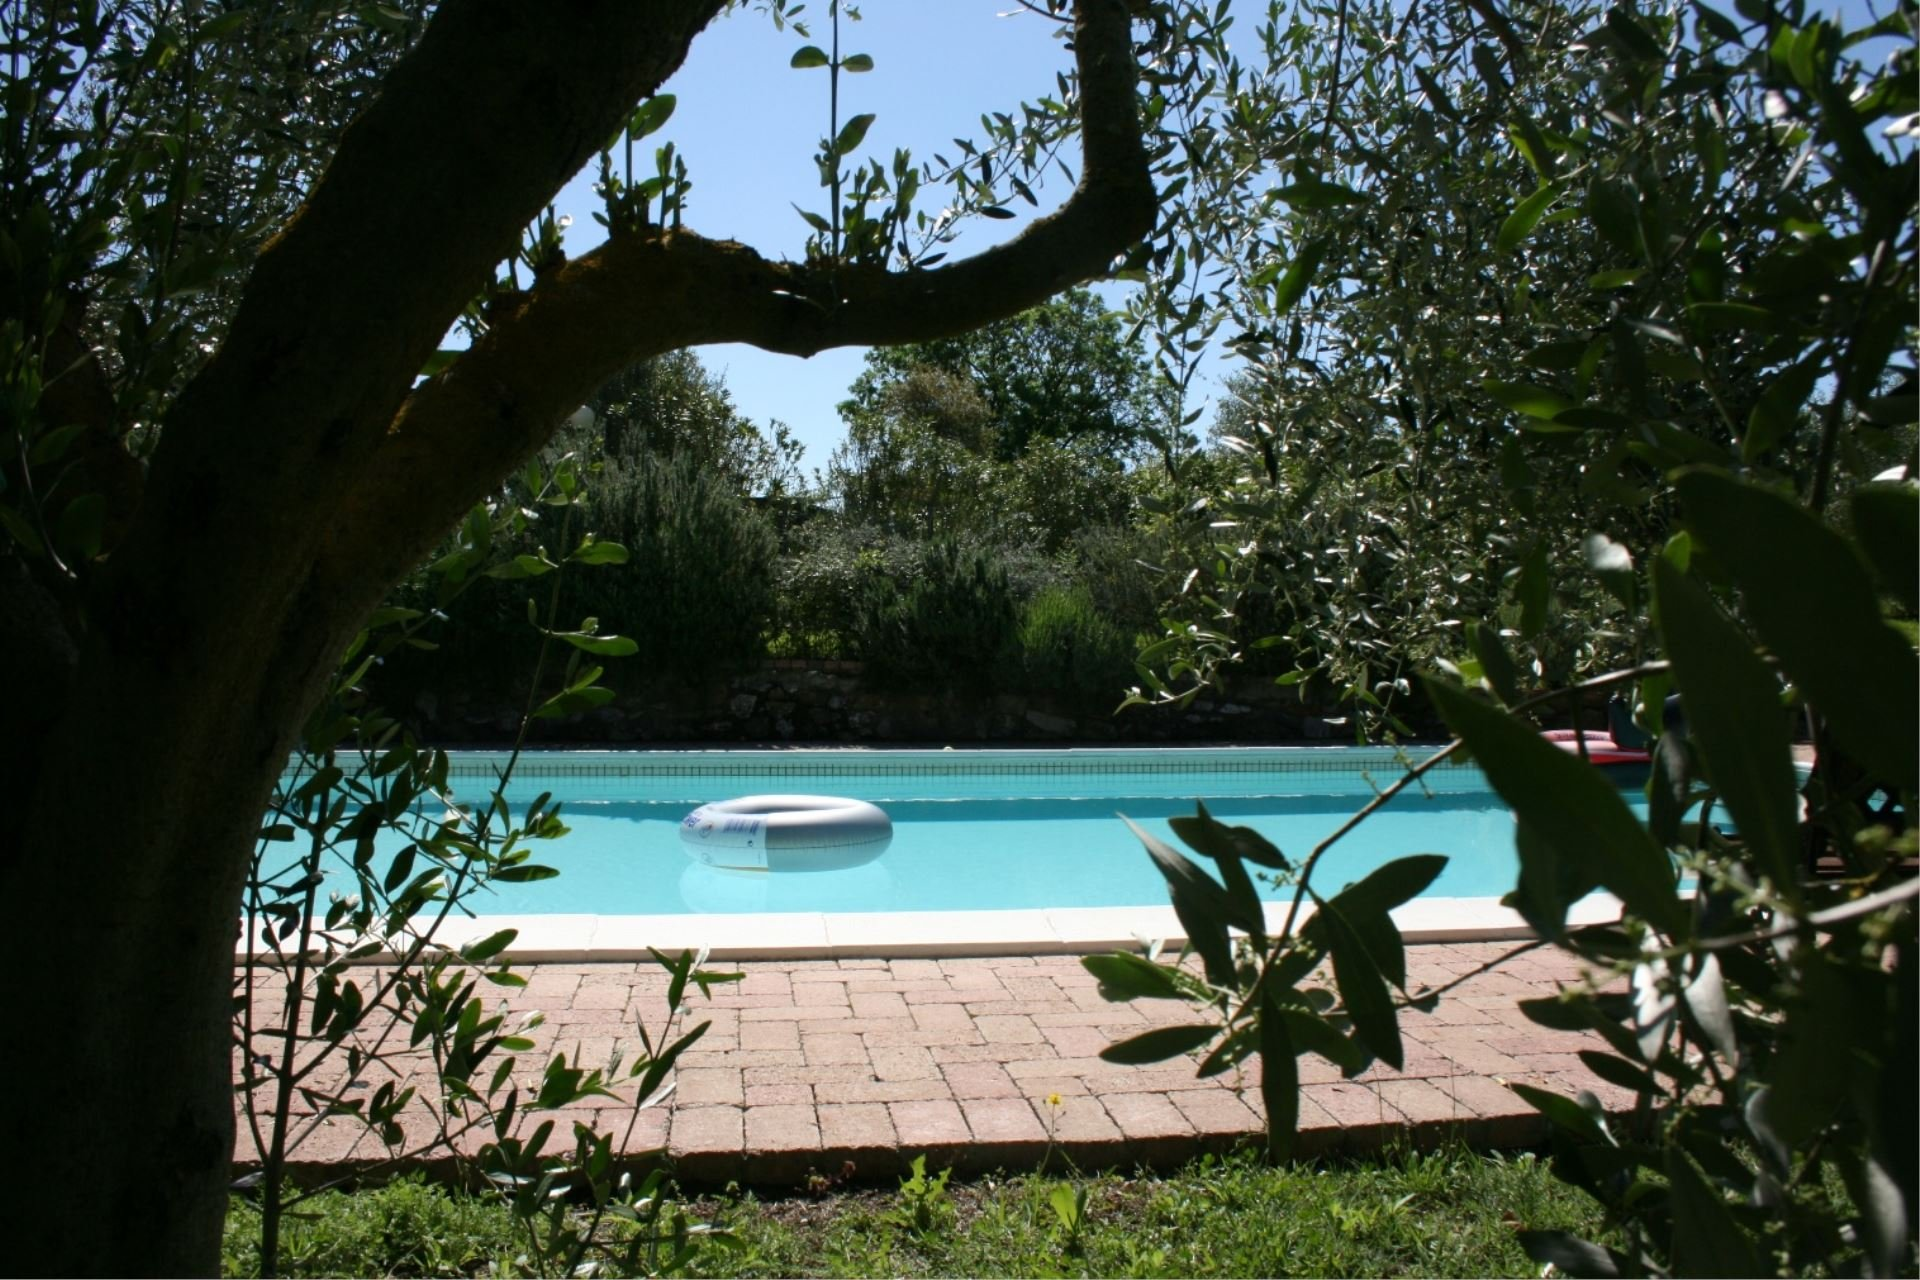 santa maria zwembad tussen de olijfbomen